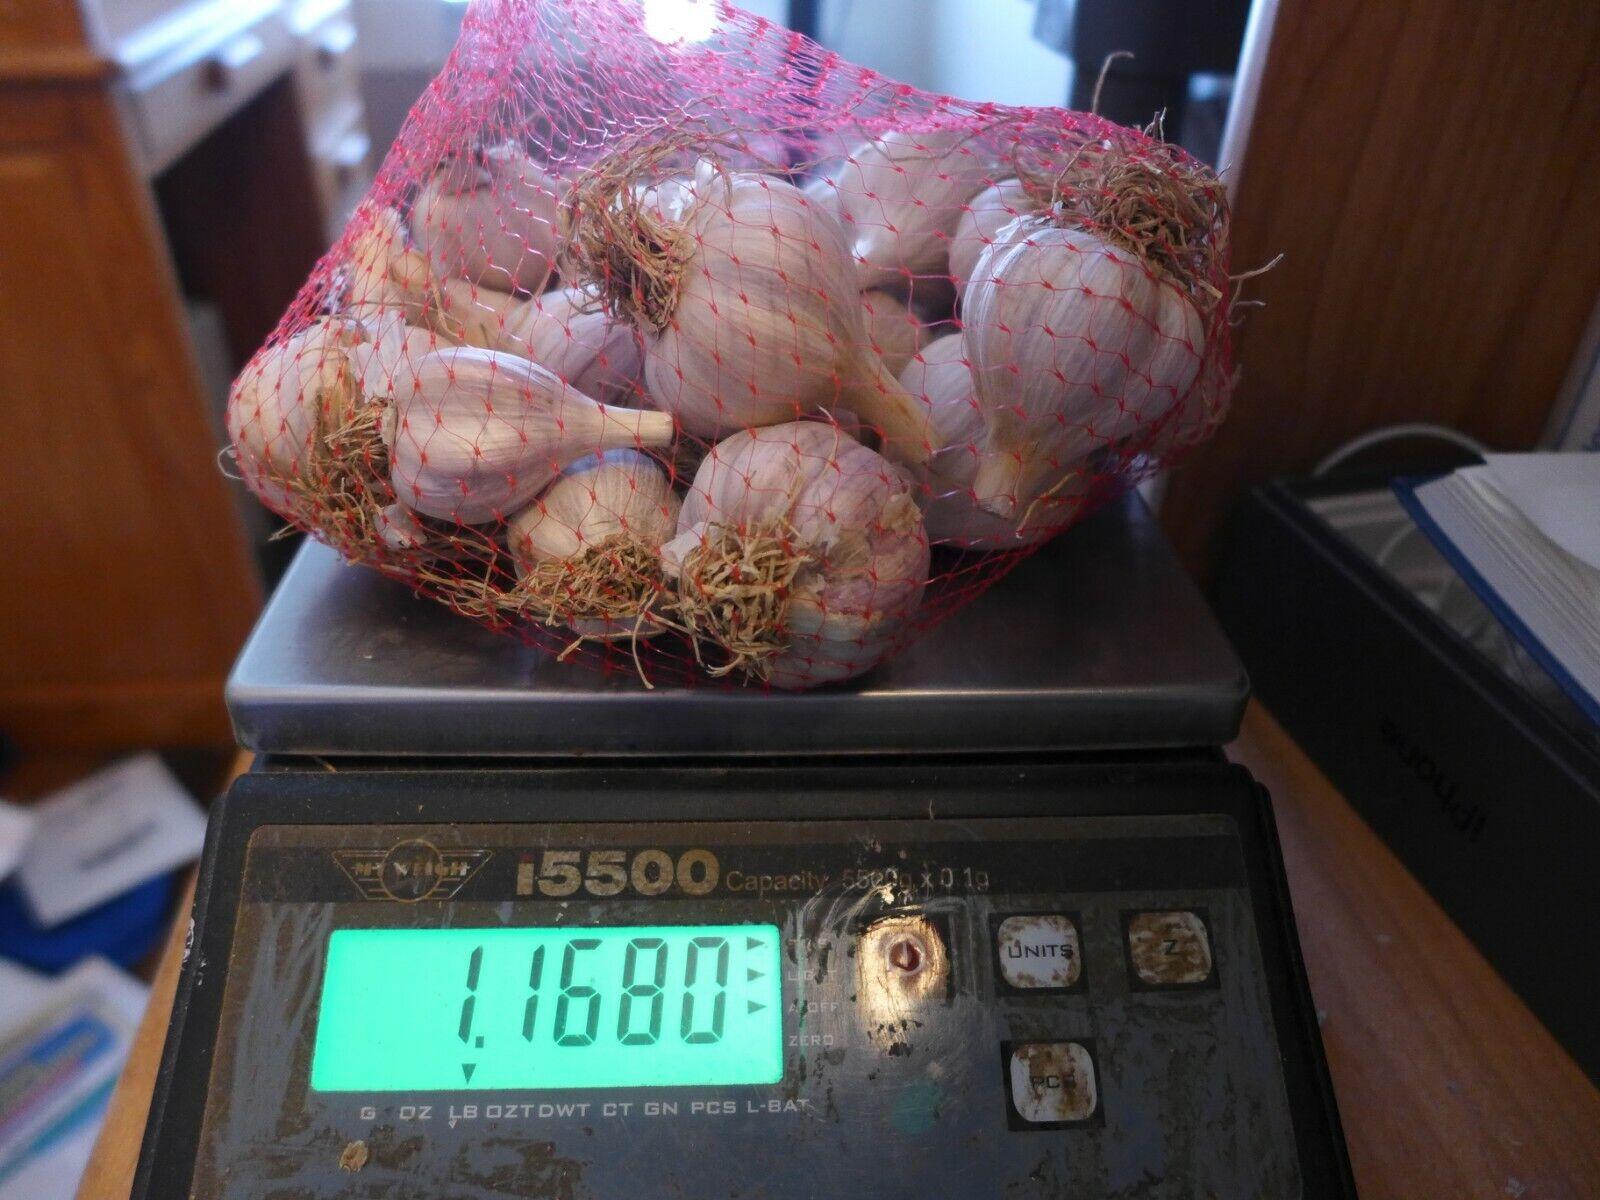 1 lb Small Organic Russian Red Garlic Bulbs grown Organically 2021 in WV